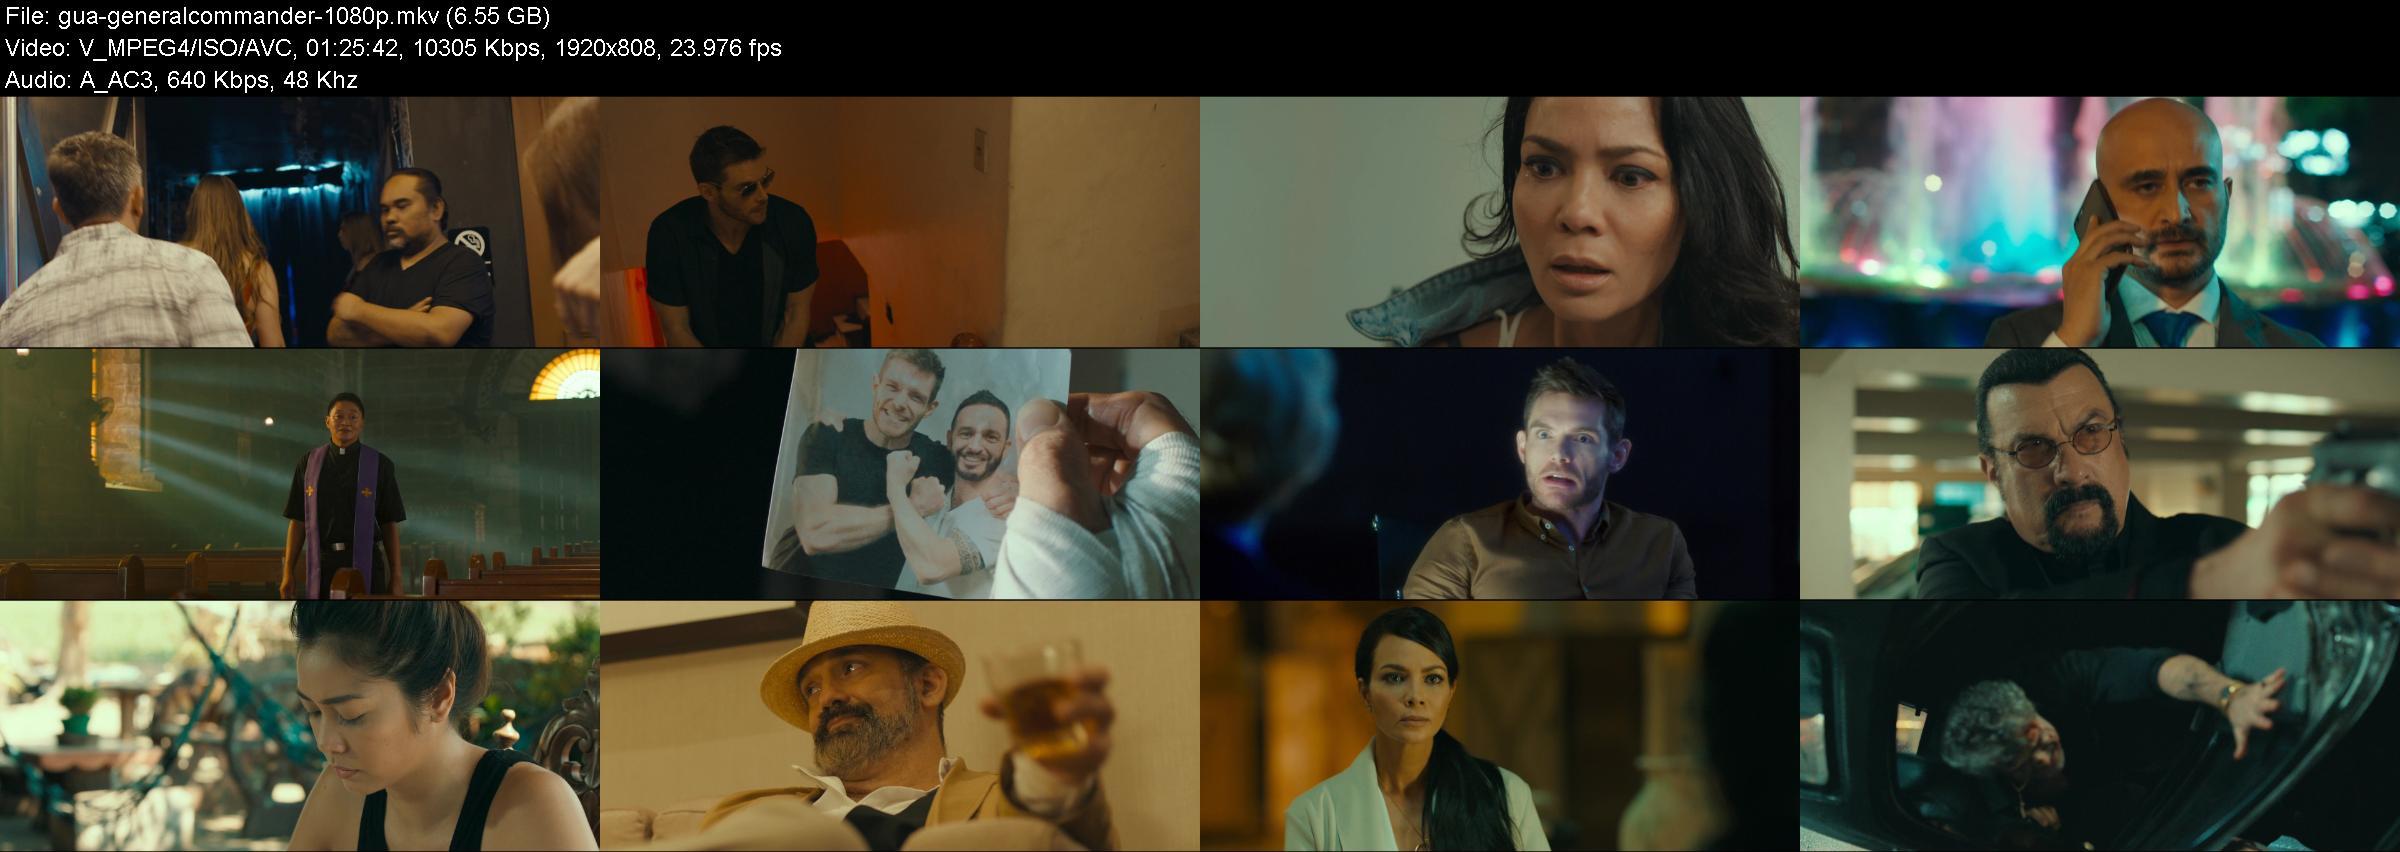 General Commander 2019 1080p BluRay x264-GUACAMOLE